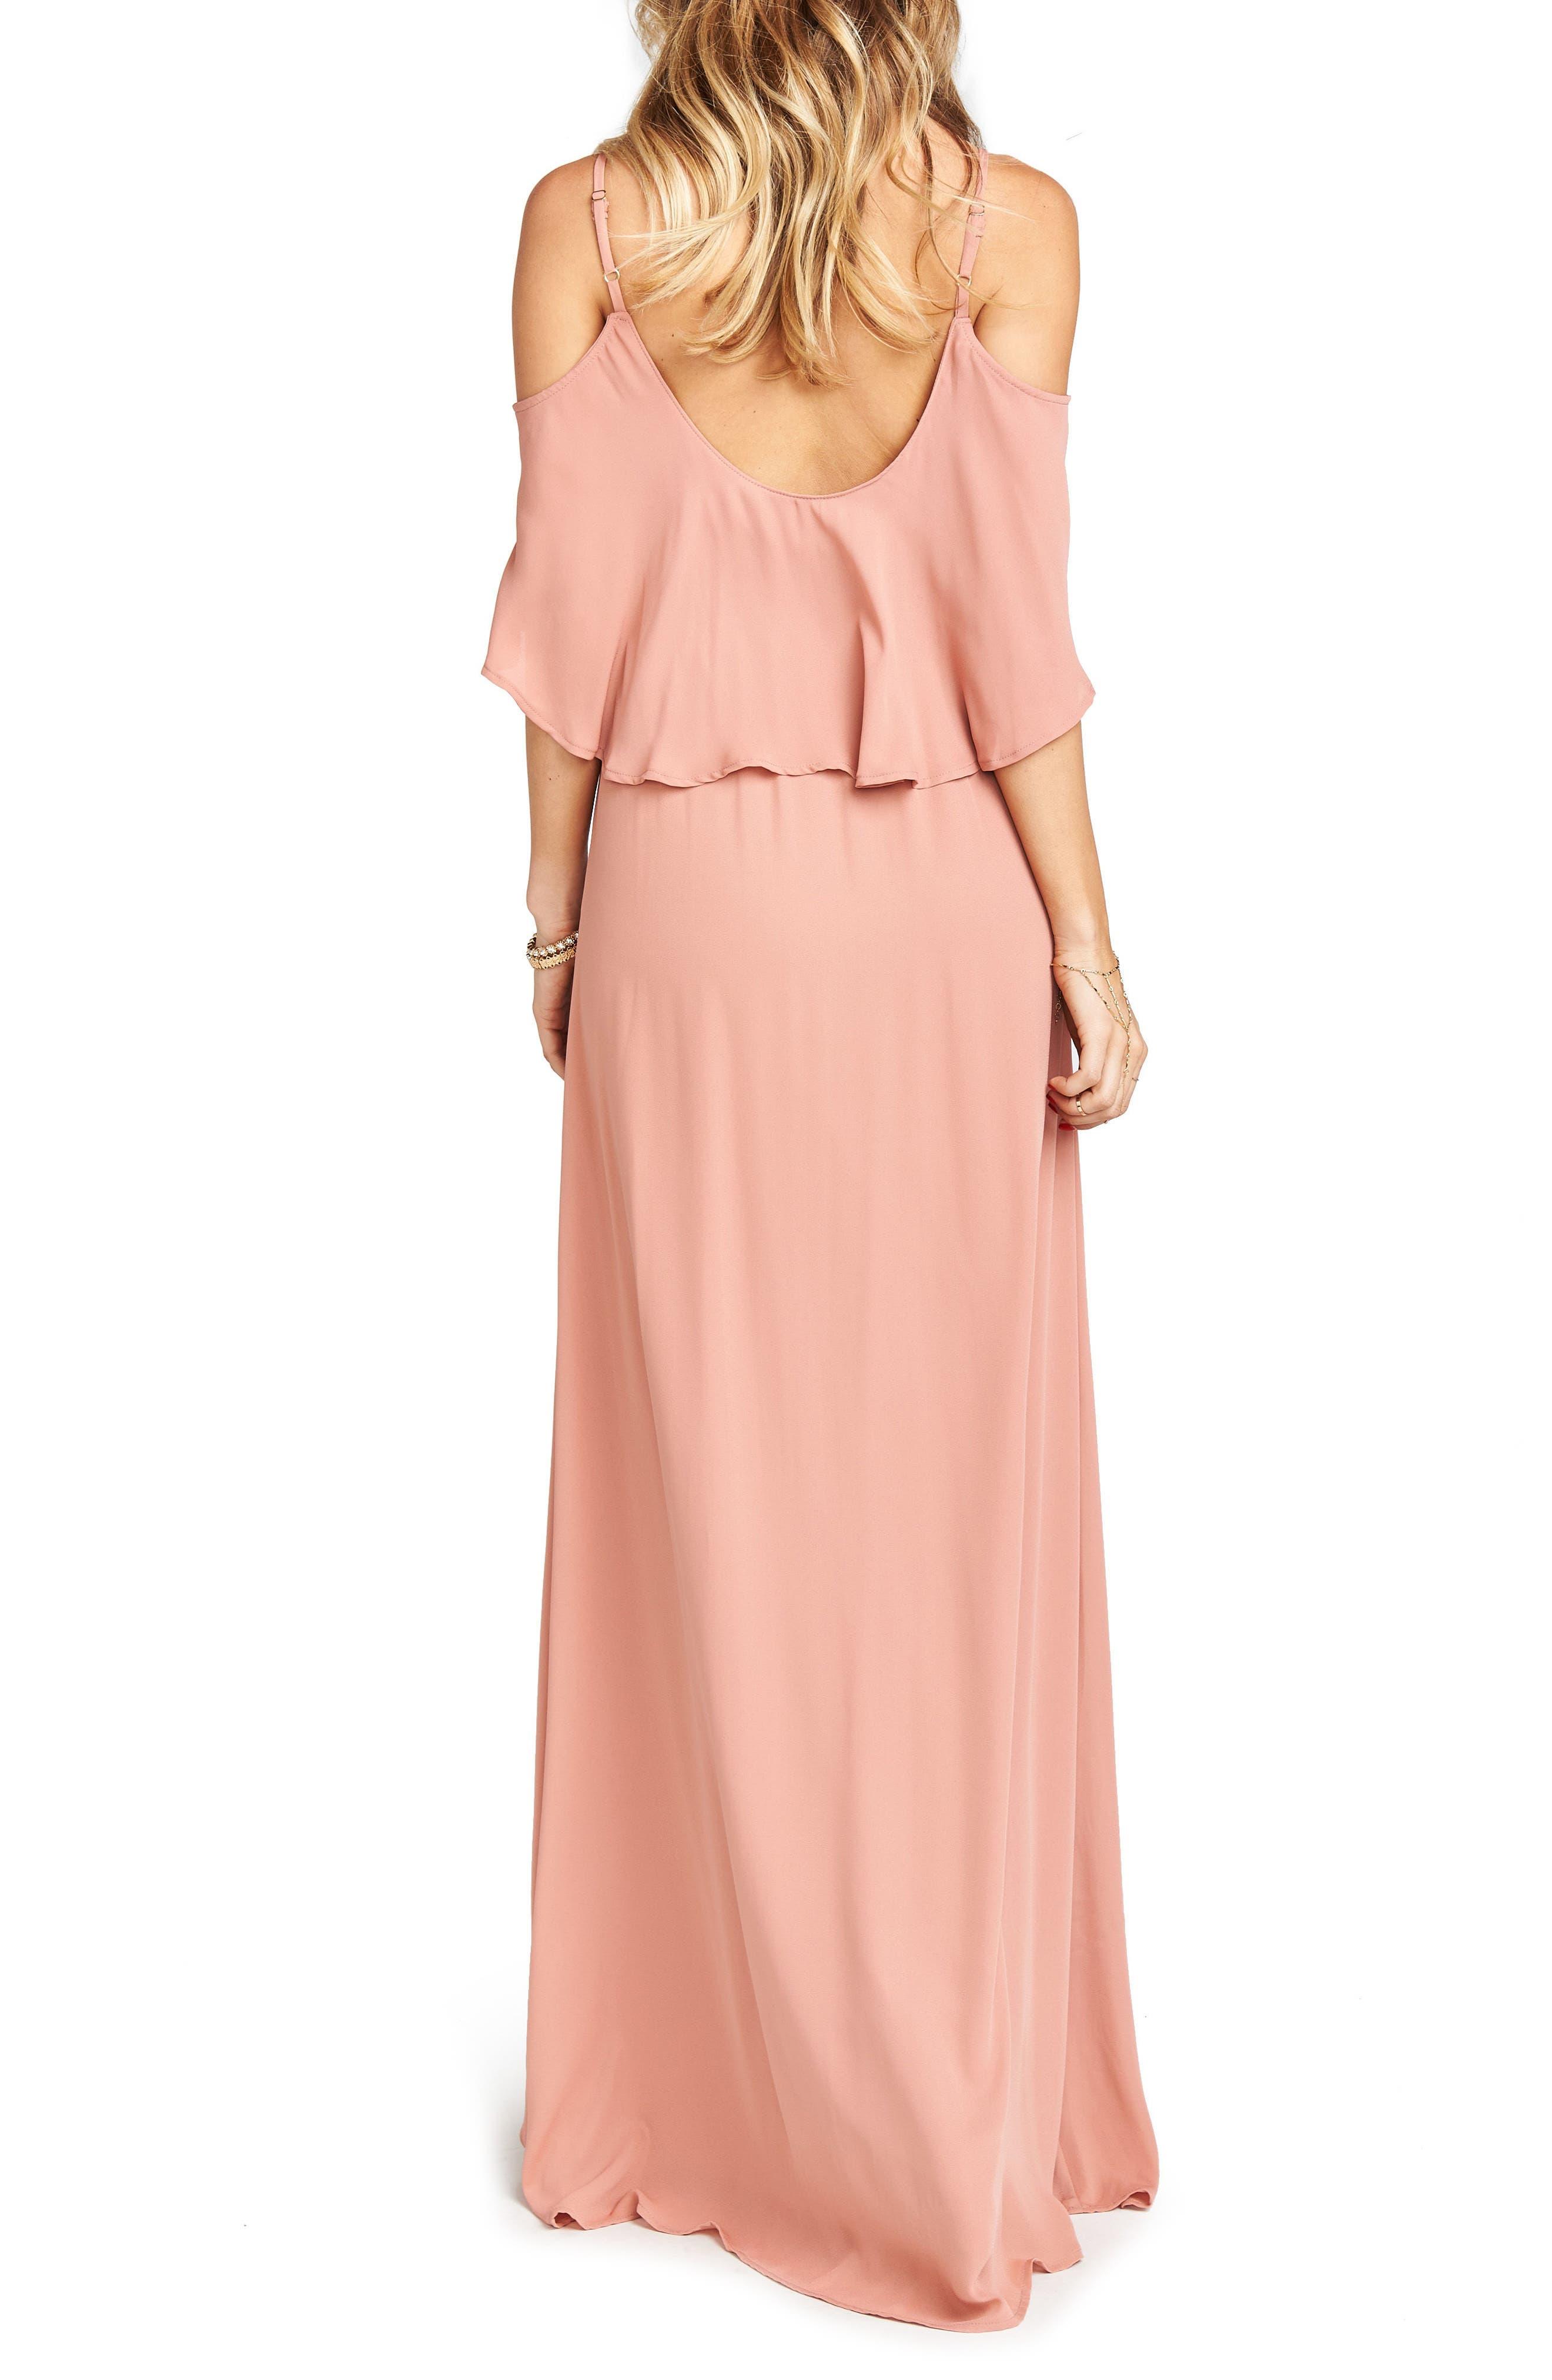 4 Short Dress Boo, Robe Femme, (Adobe), 40